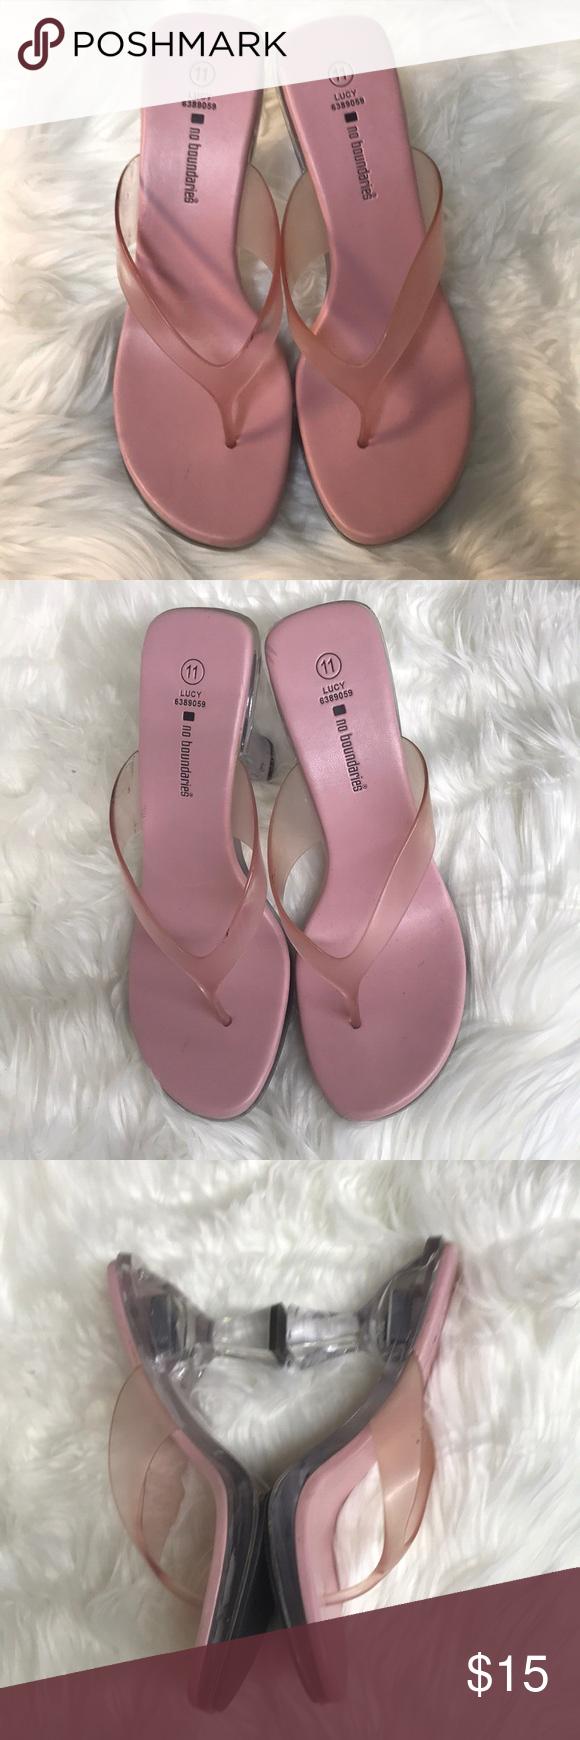 New Pink Light Up ~ No Boundaries Heel